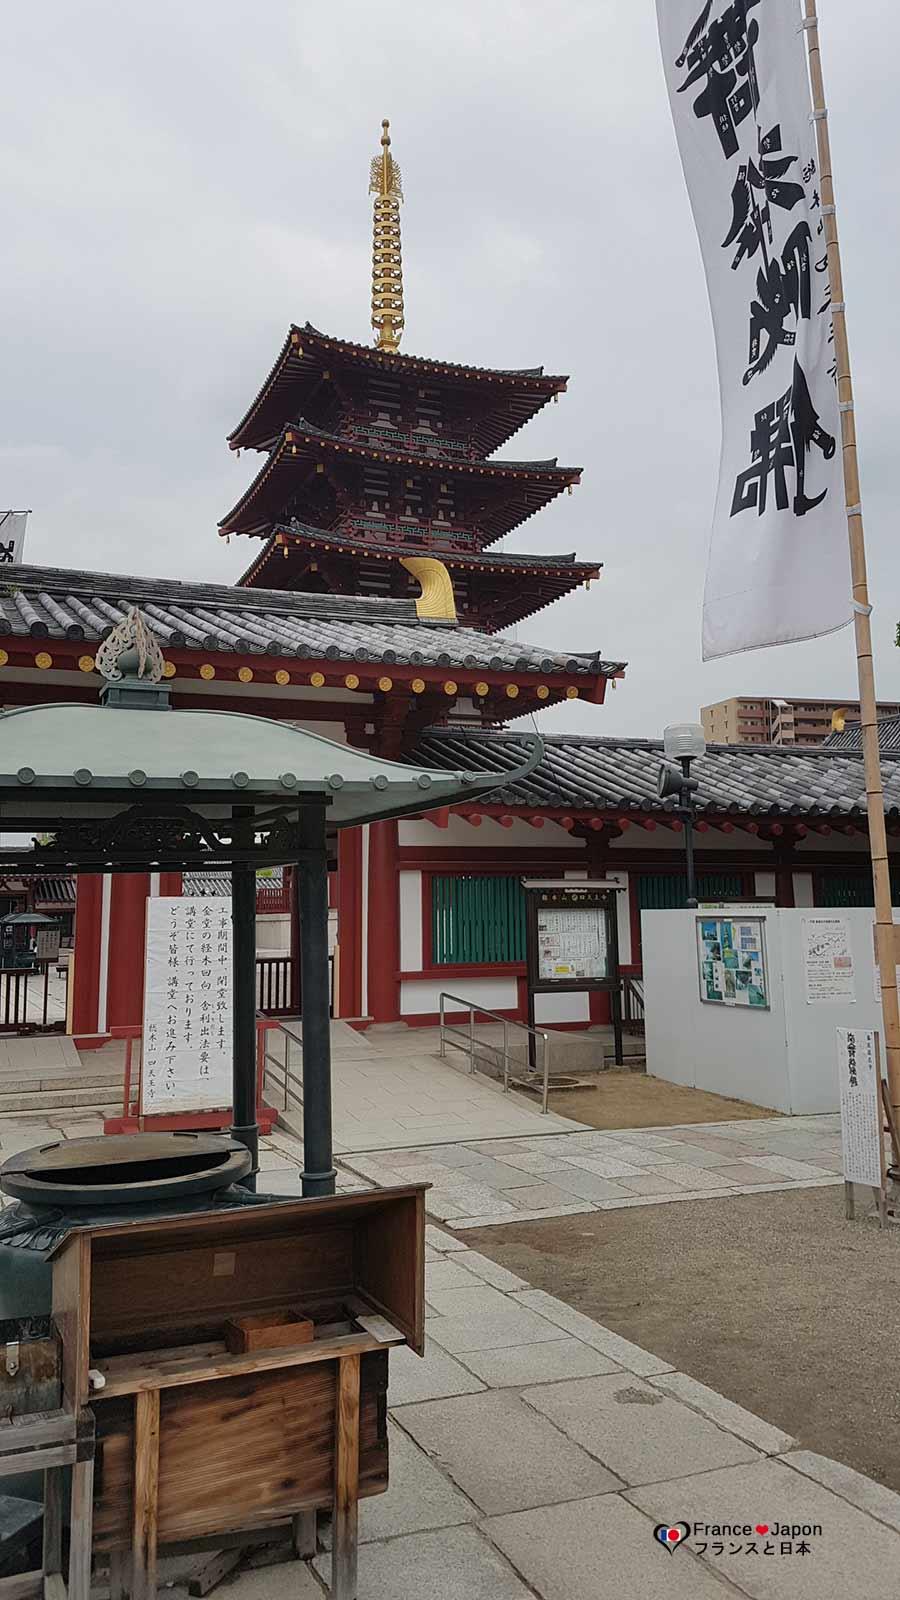 voyage japon visiter temple shitennoji osaka Shitenno ji